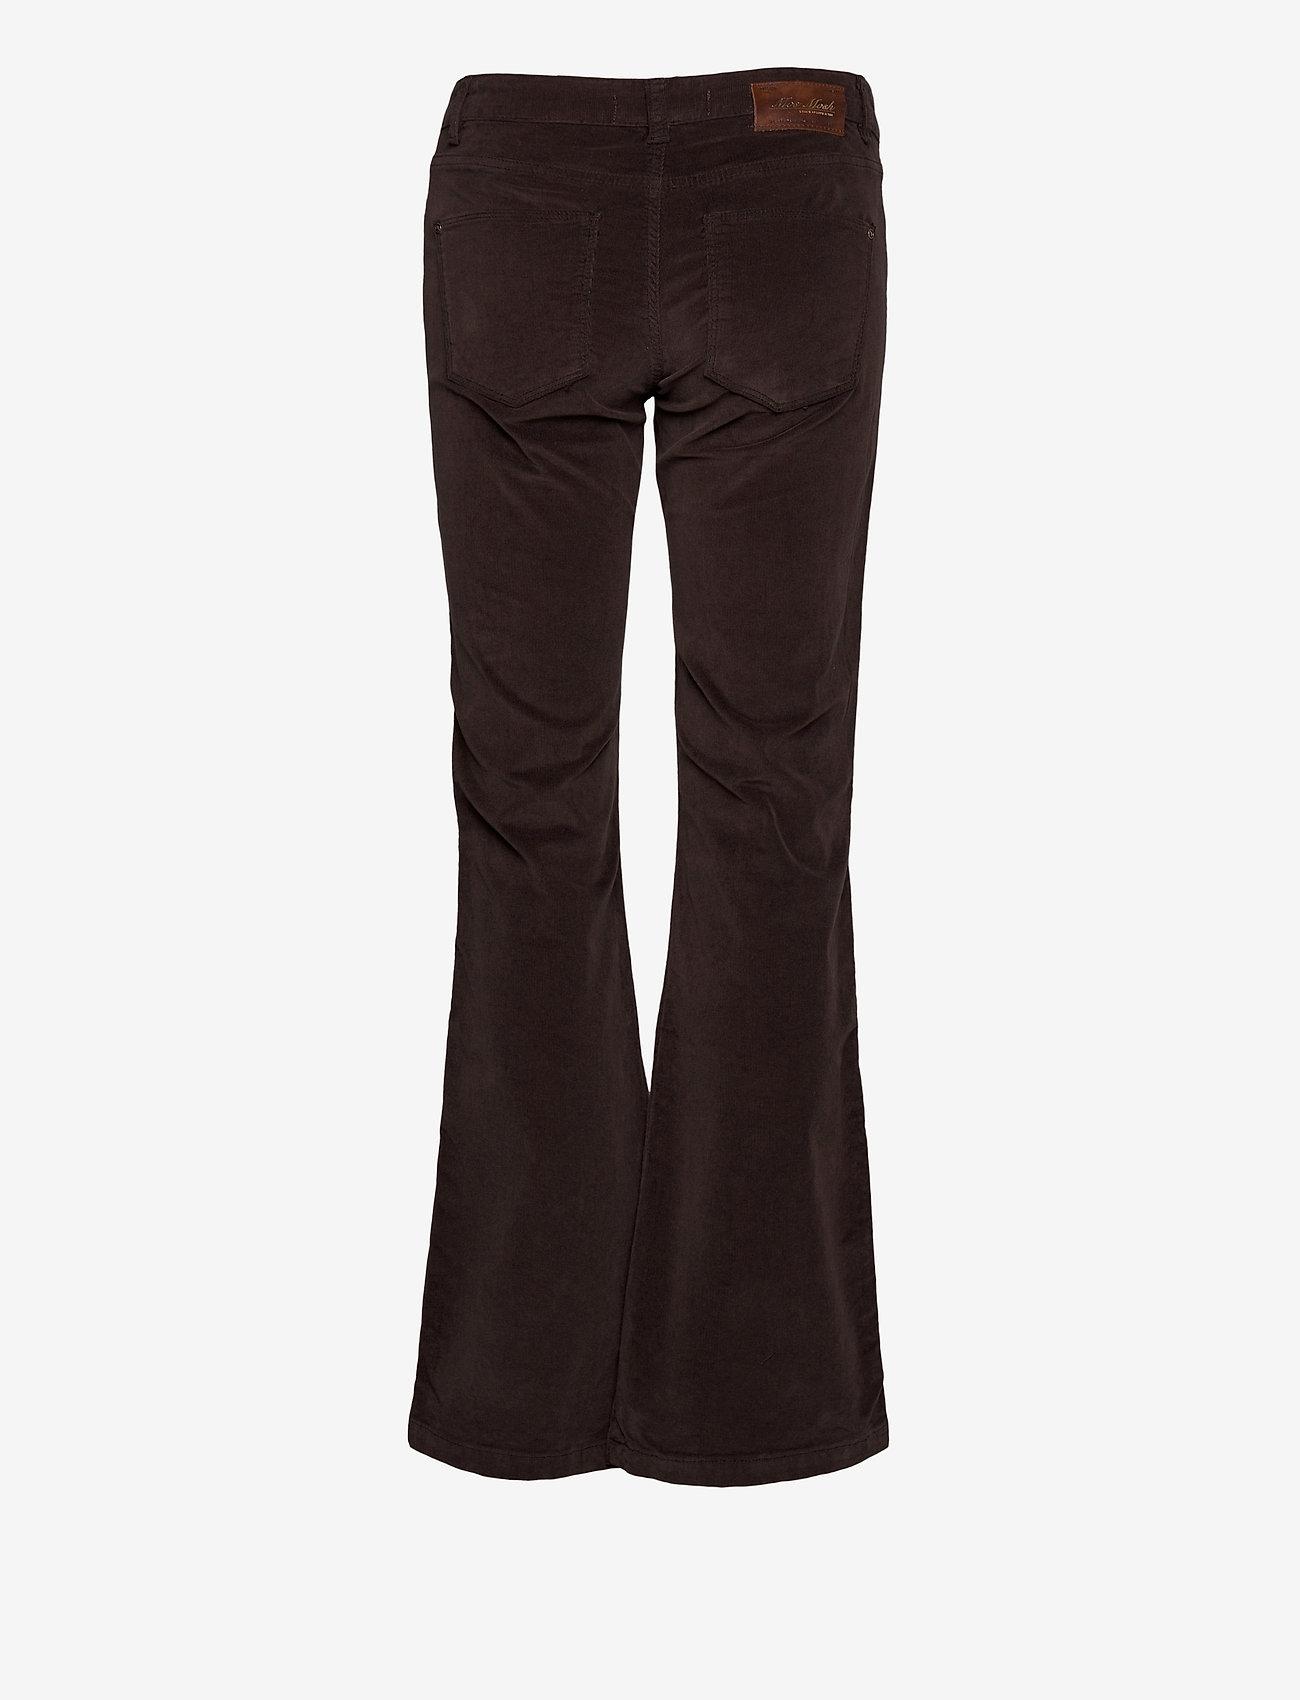 MOS MOSH - Victoria Corduroy Flare Pant - schlaghosen - molé brown - 1